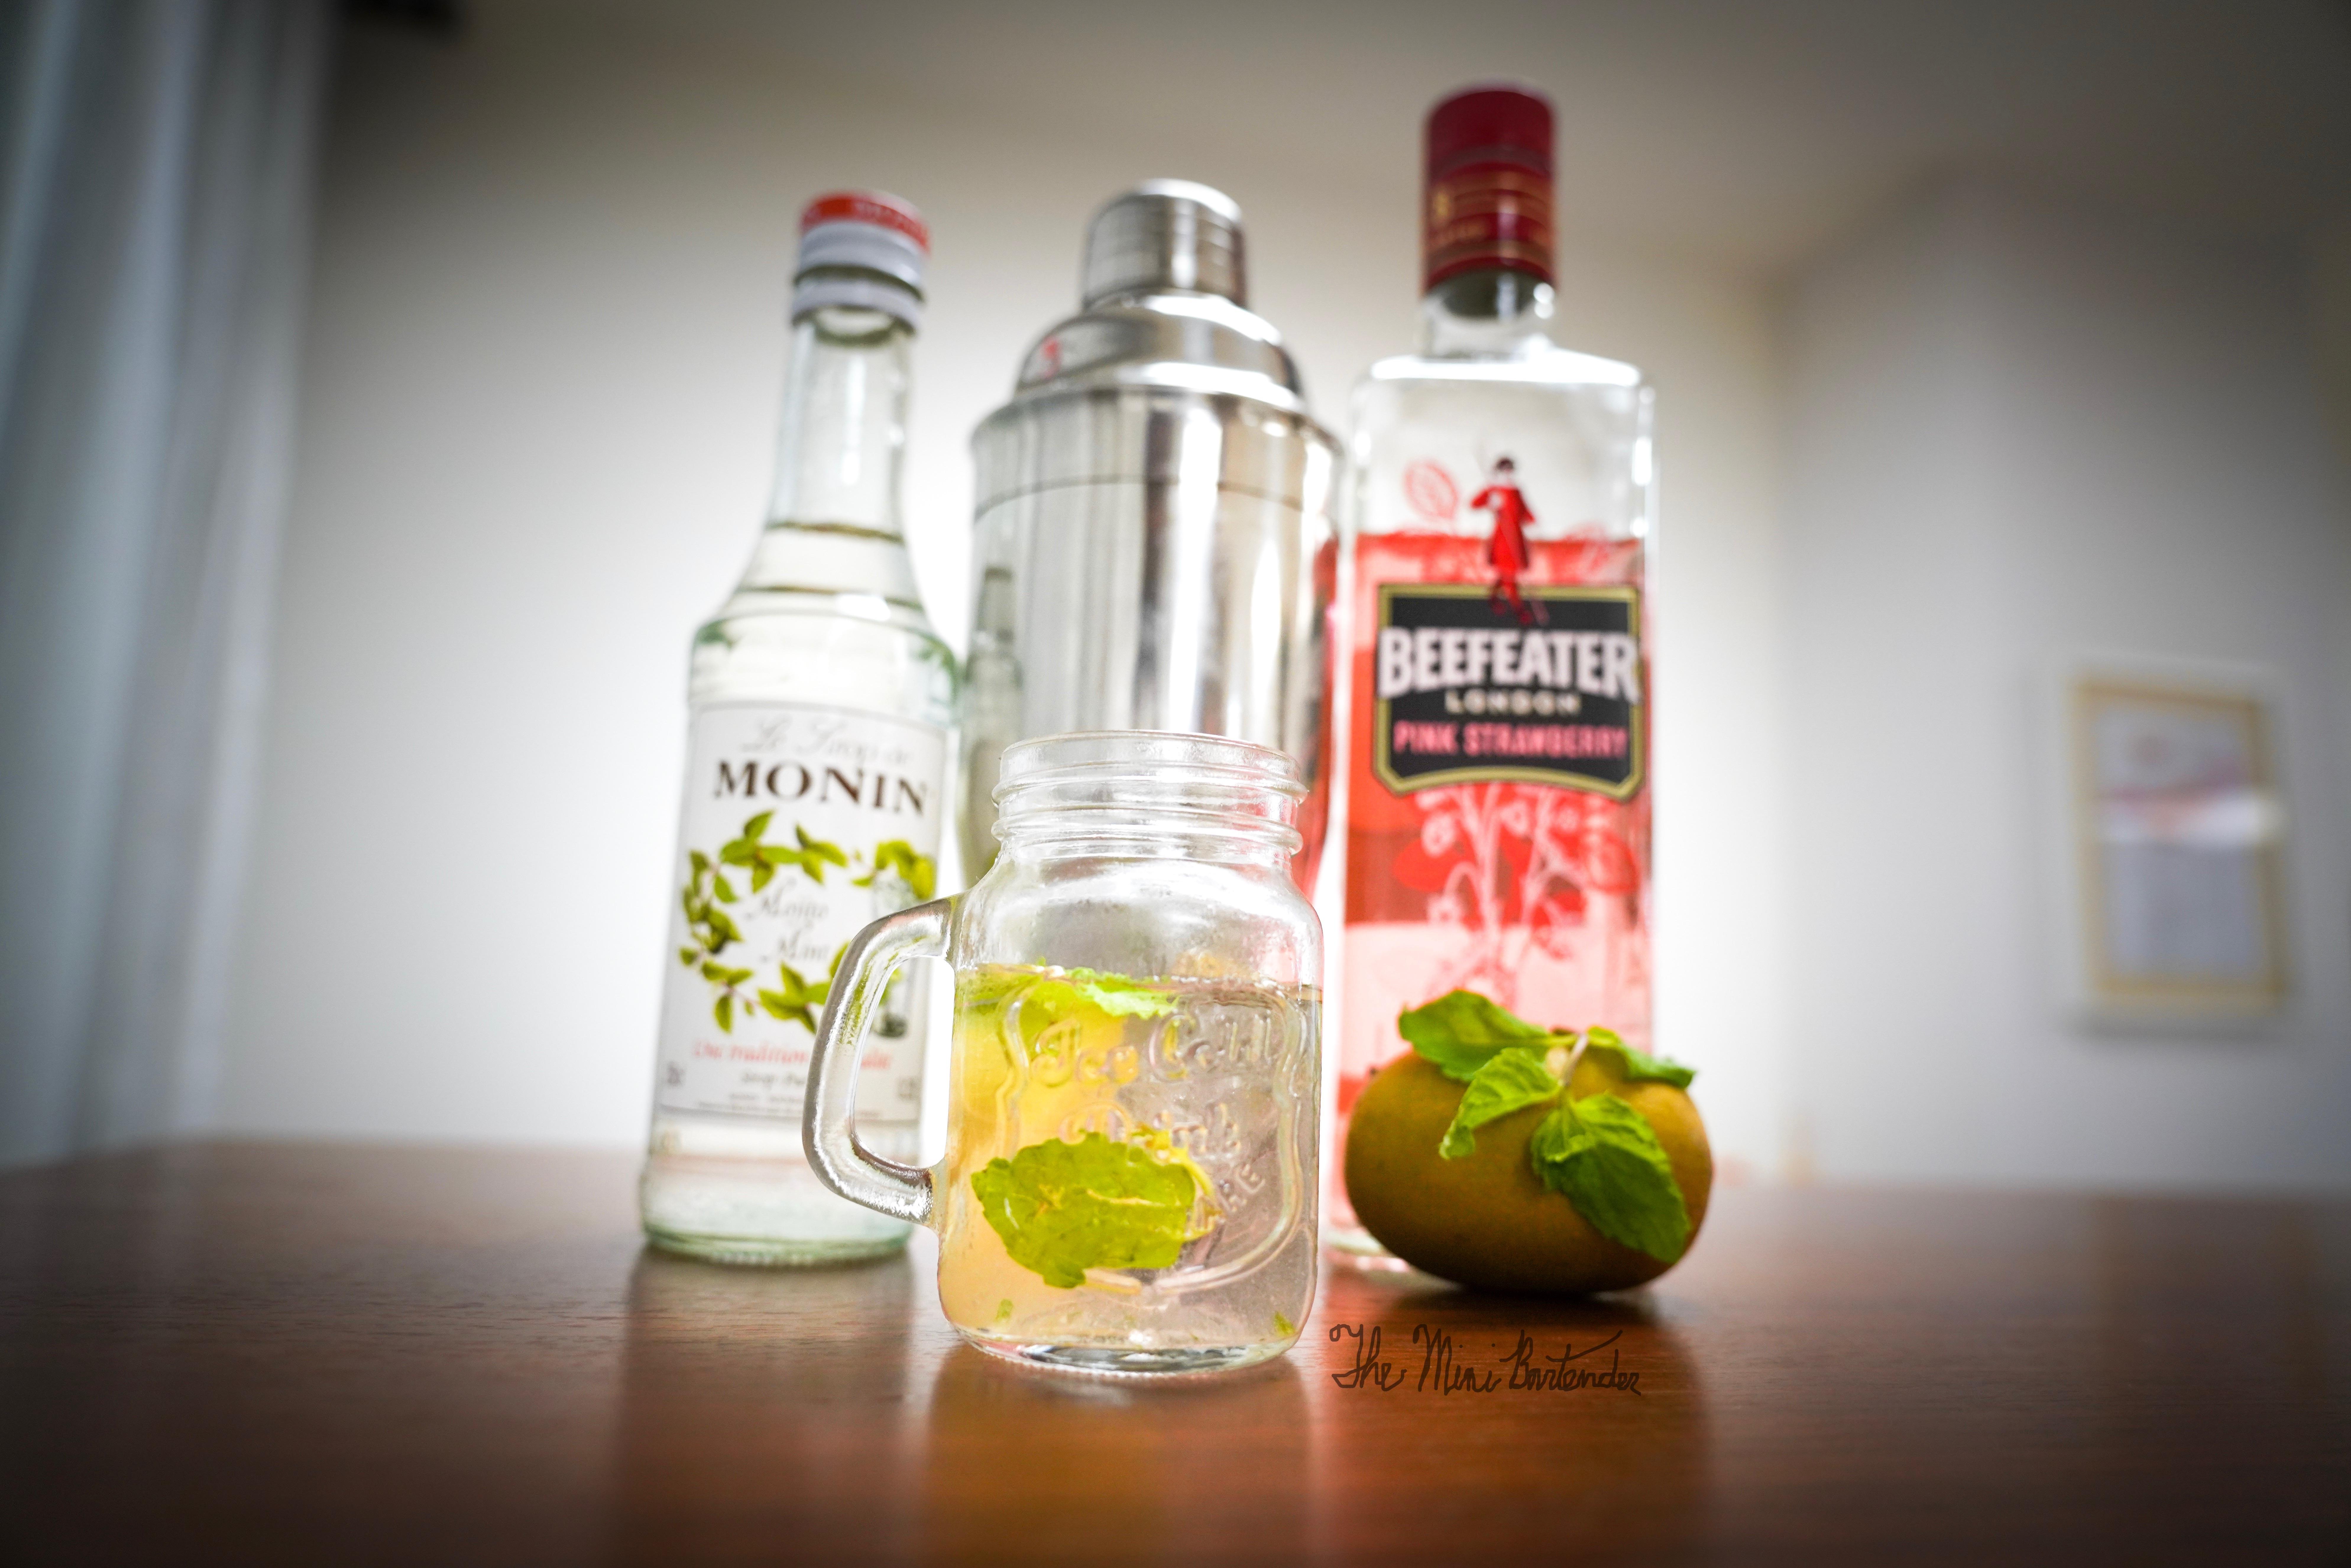 Strawberry Kiwi Mint Gin